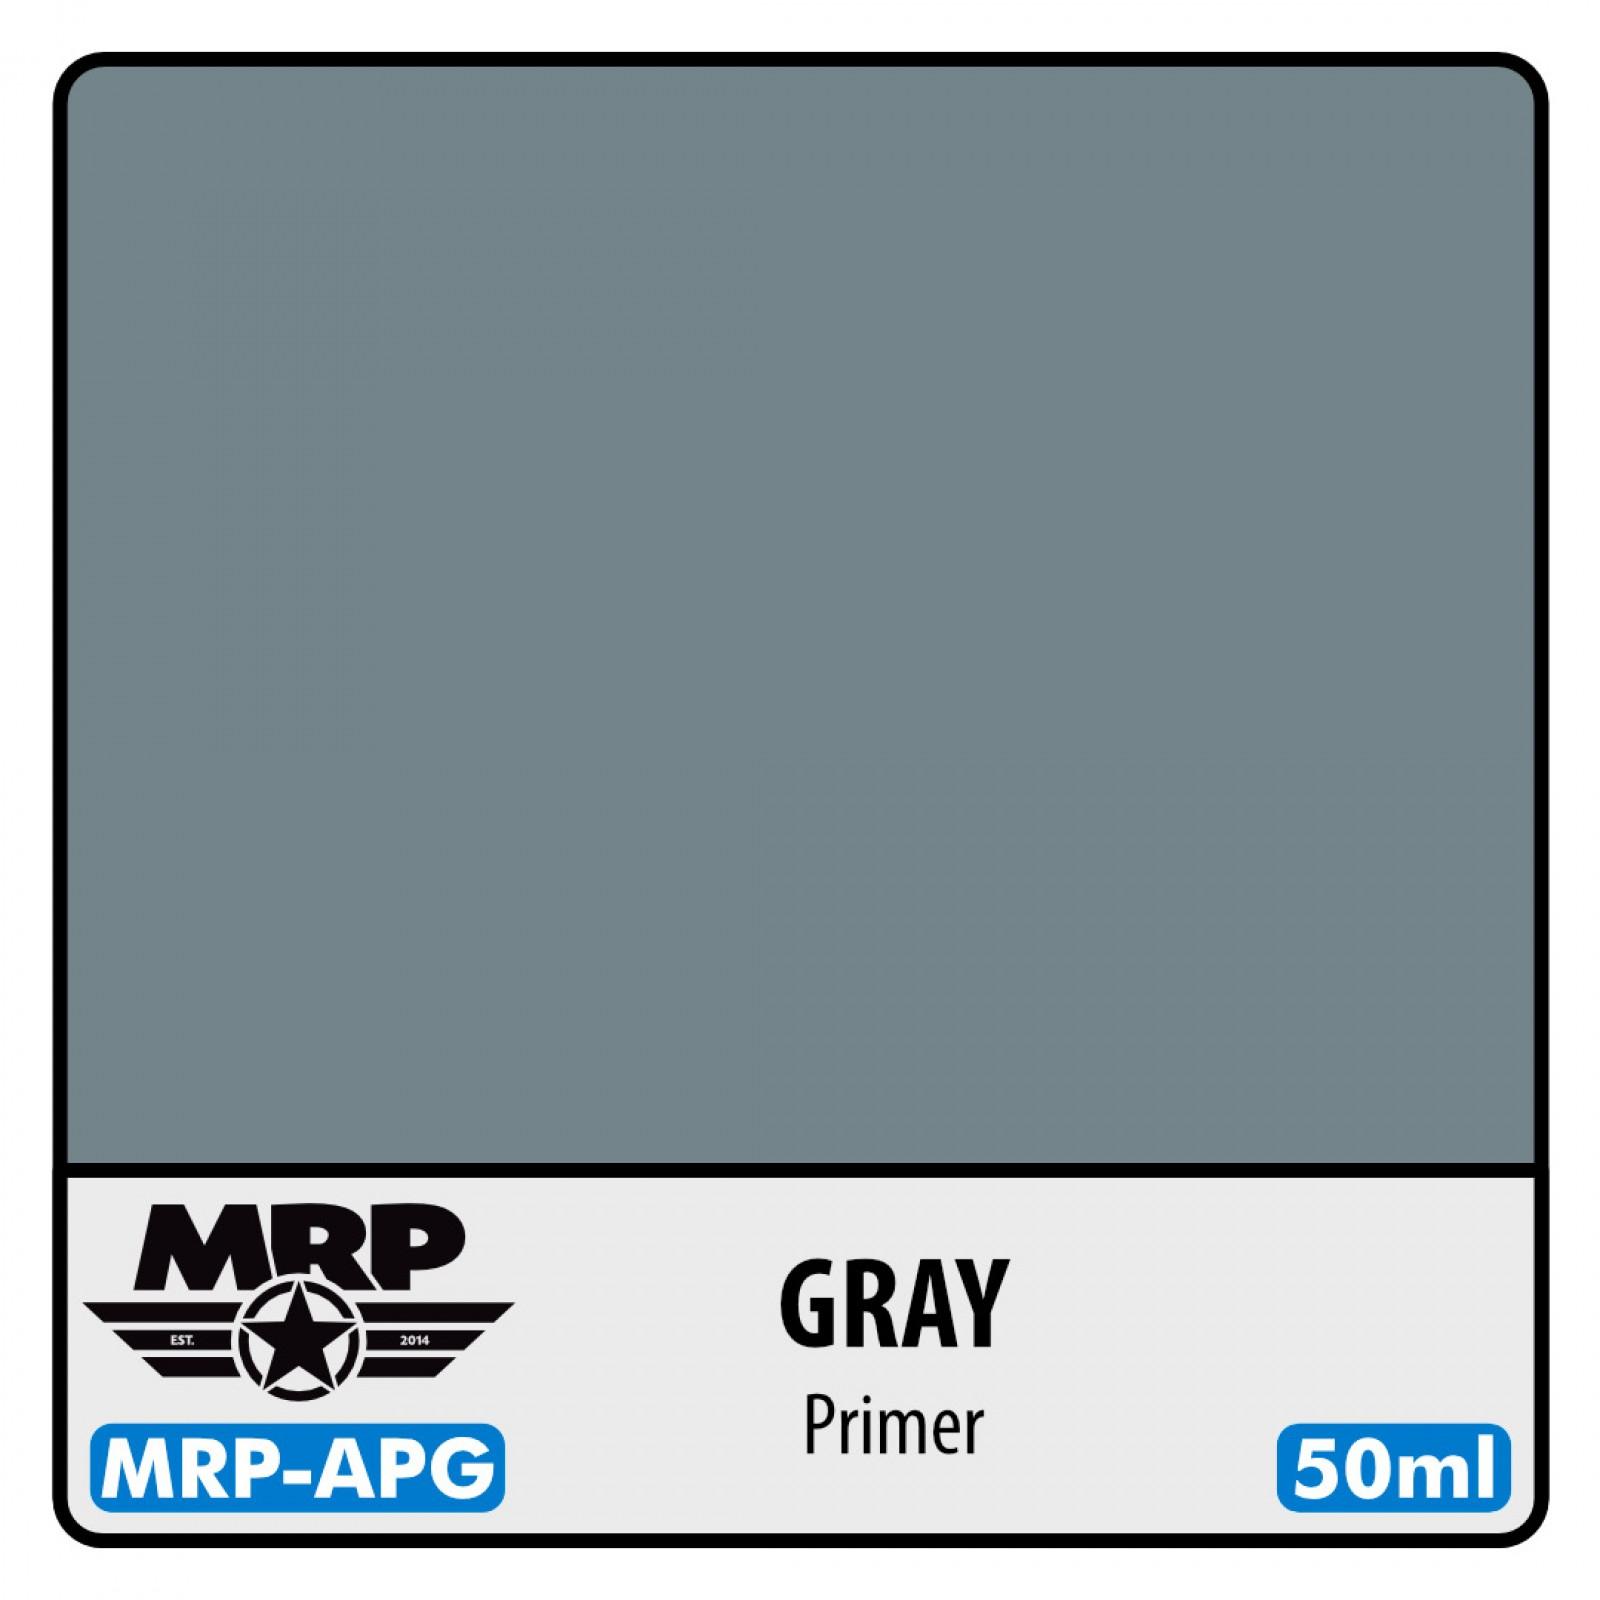 MRP-APG Primer GREY